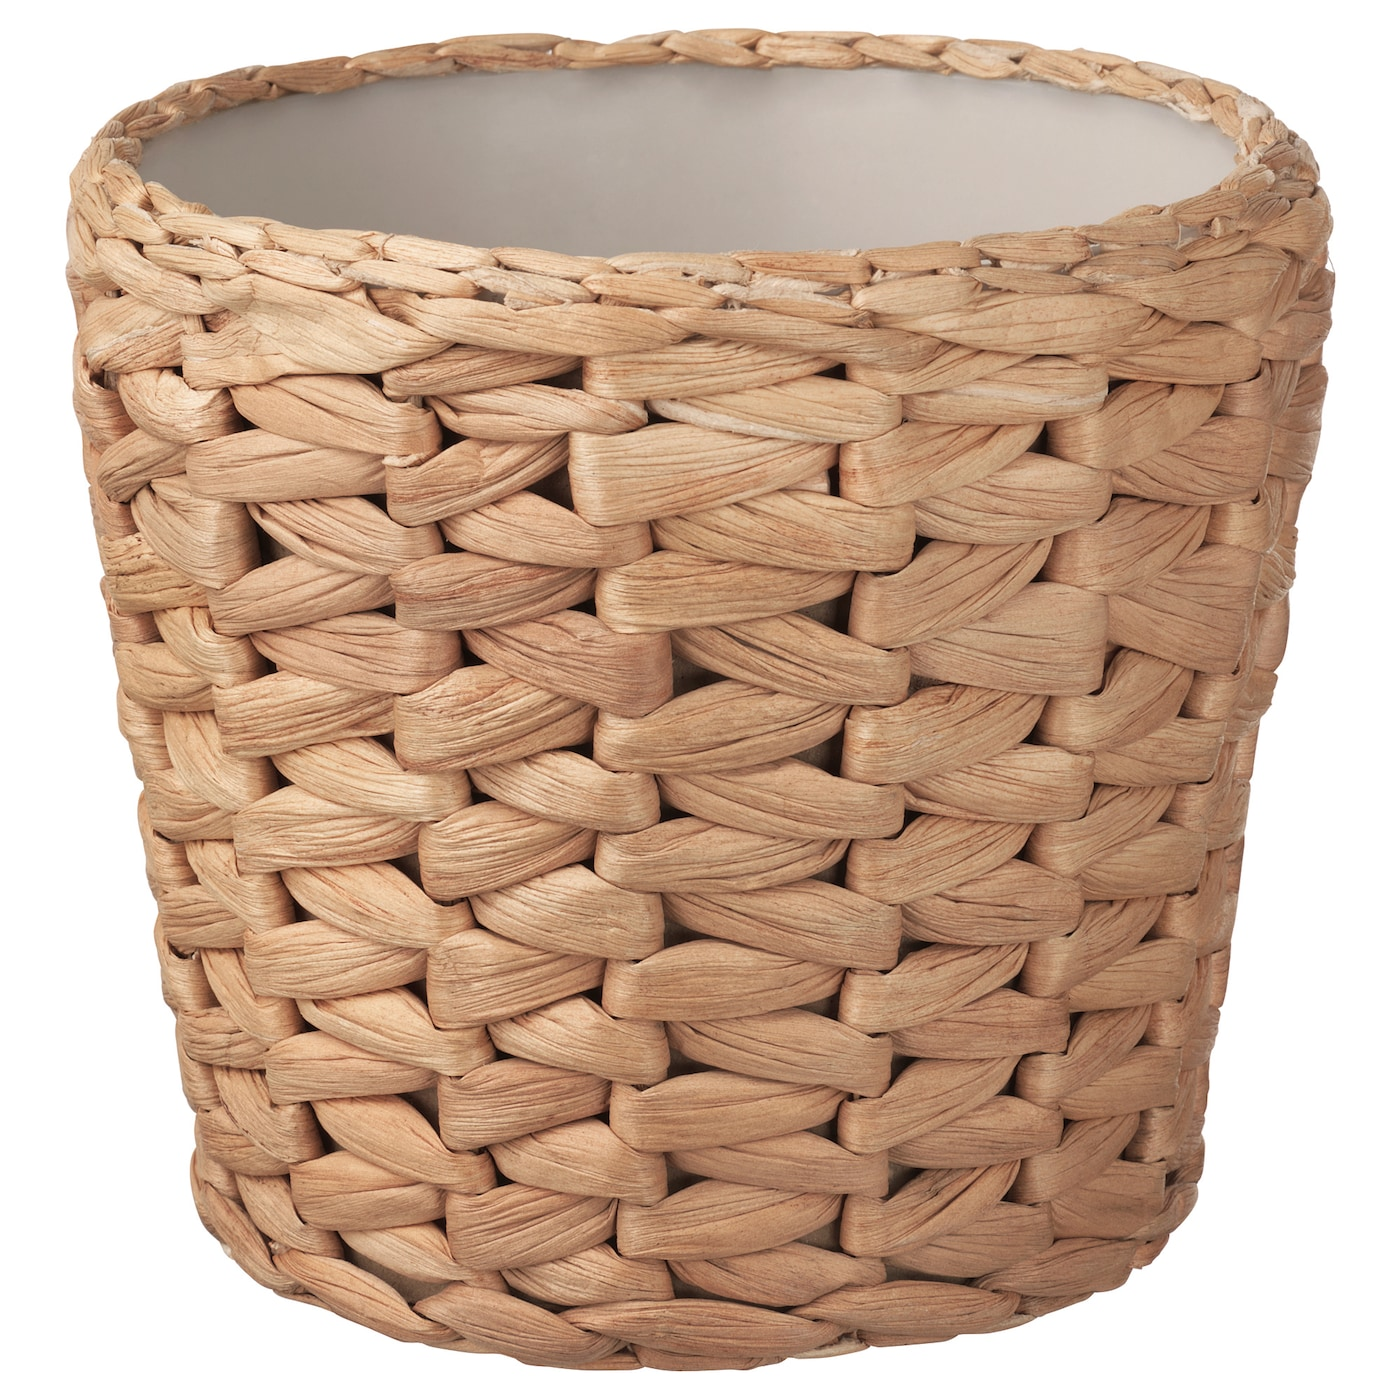 Ikea FRIDFULL Cache-pot, jacinthe d'eau12 cm